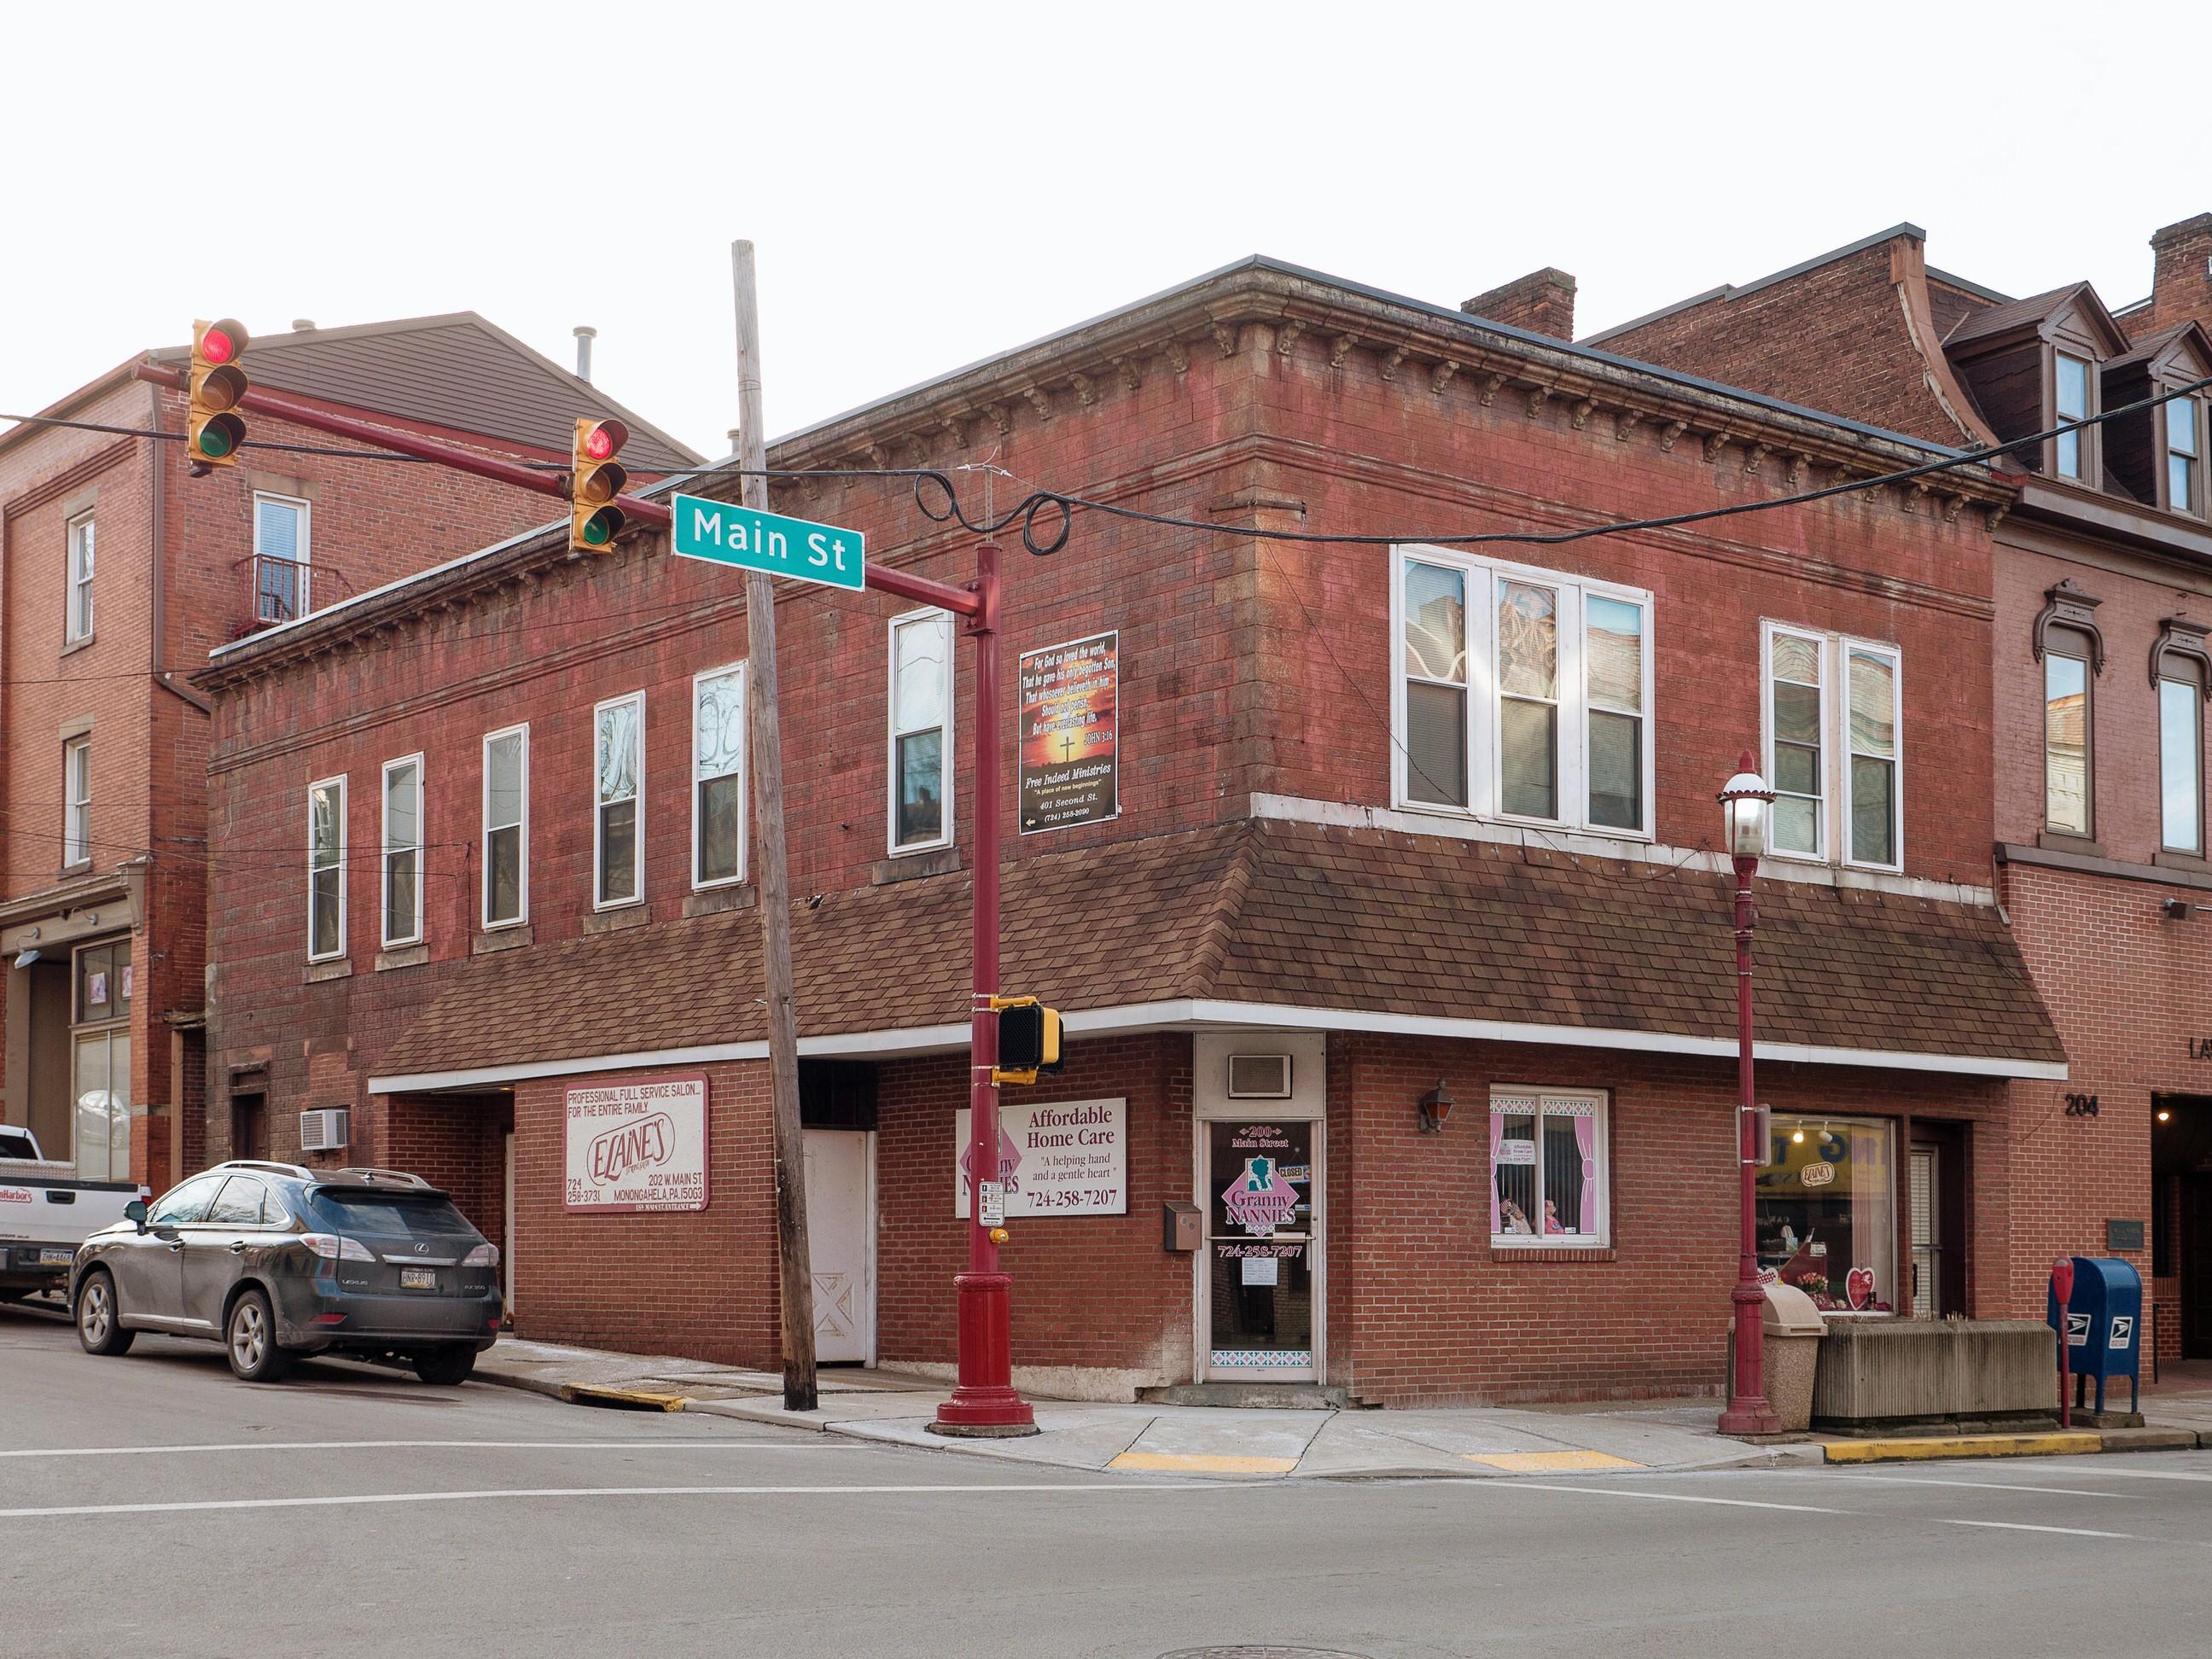 Photo of building at 200 - 202 West Main Street, Monongahela, Pa. 15063 along rt 88 and rt 136. Photo property of the Monongahela Main Street Program.